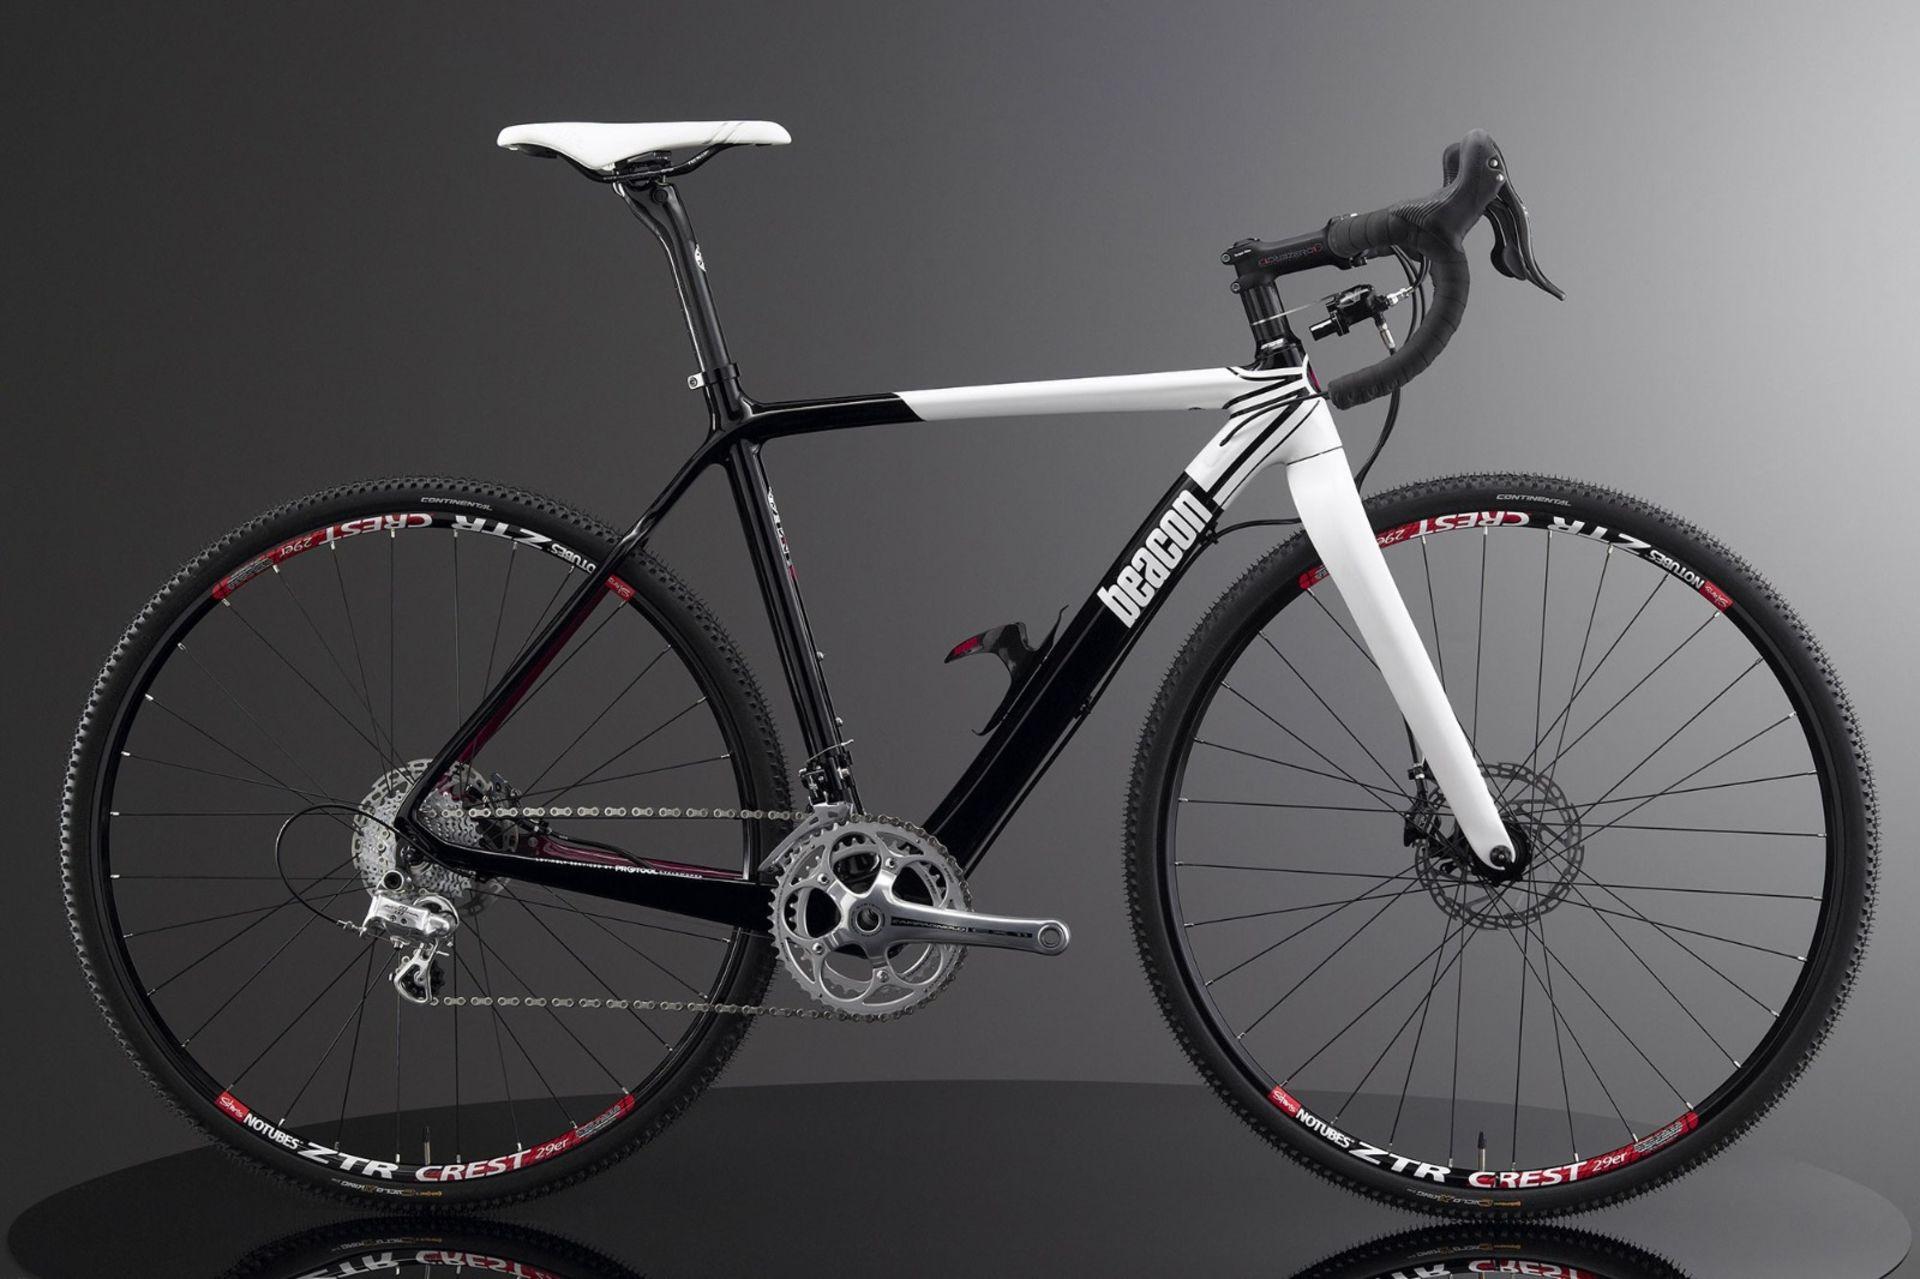 Lot 20 - 1 x Beacon Model BF-45, Size 580, Carbon Fibre Bike Frame in Black & White.